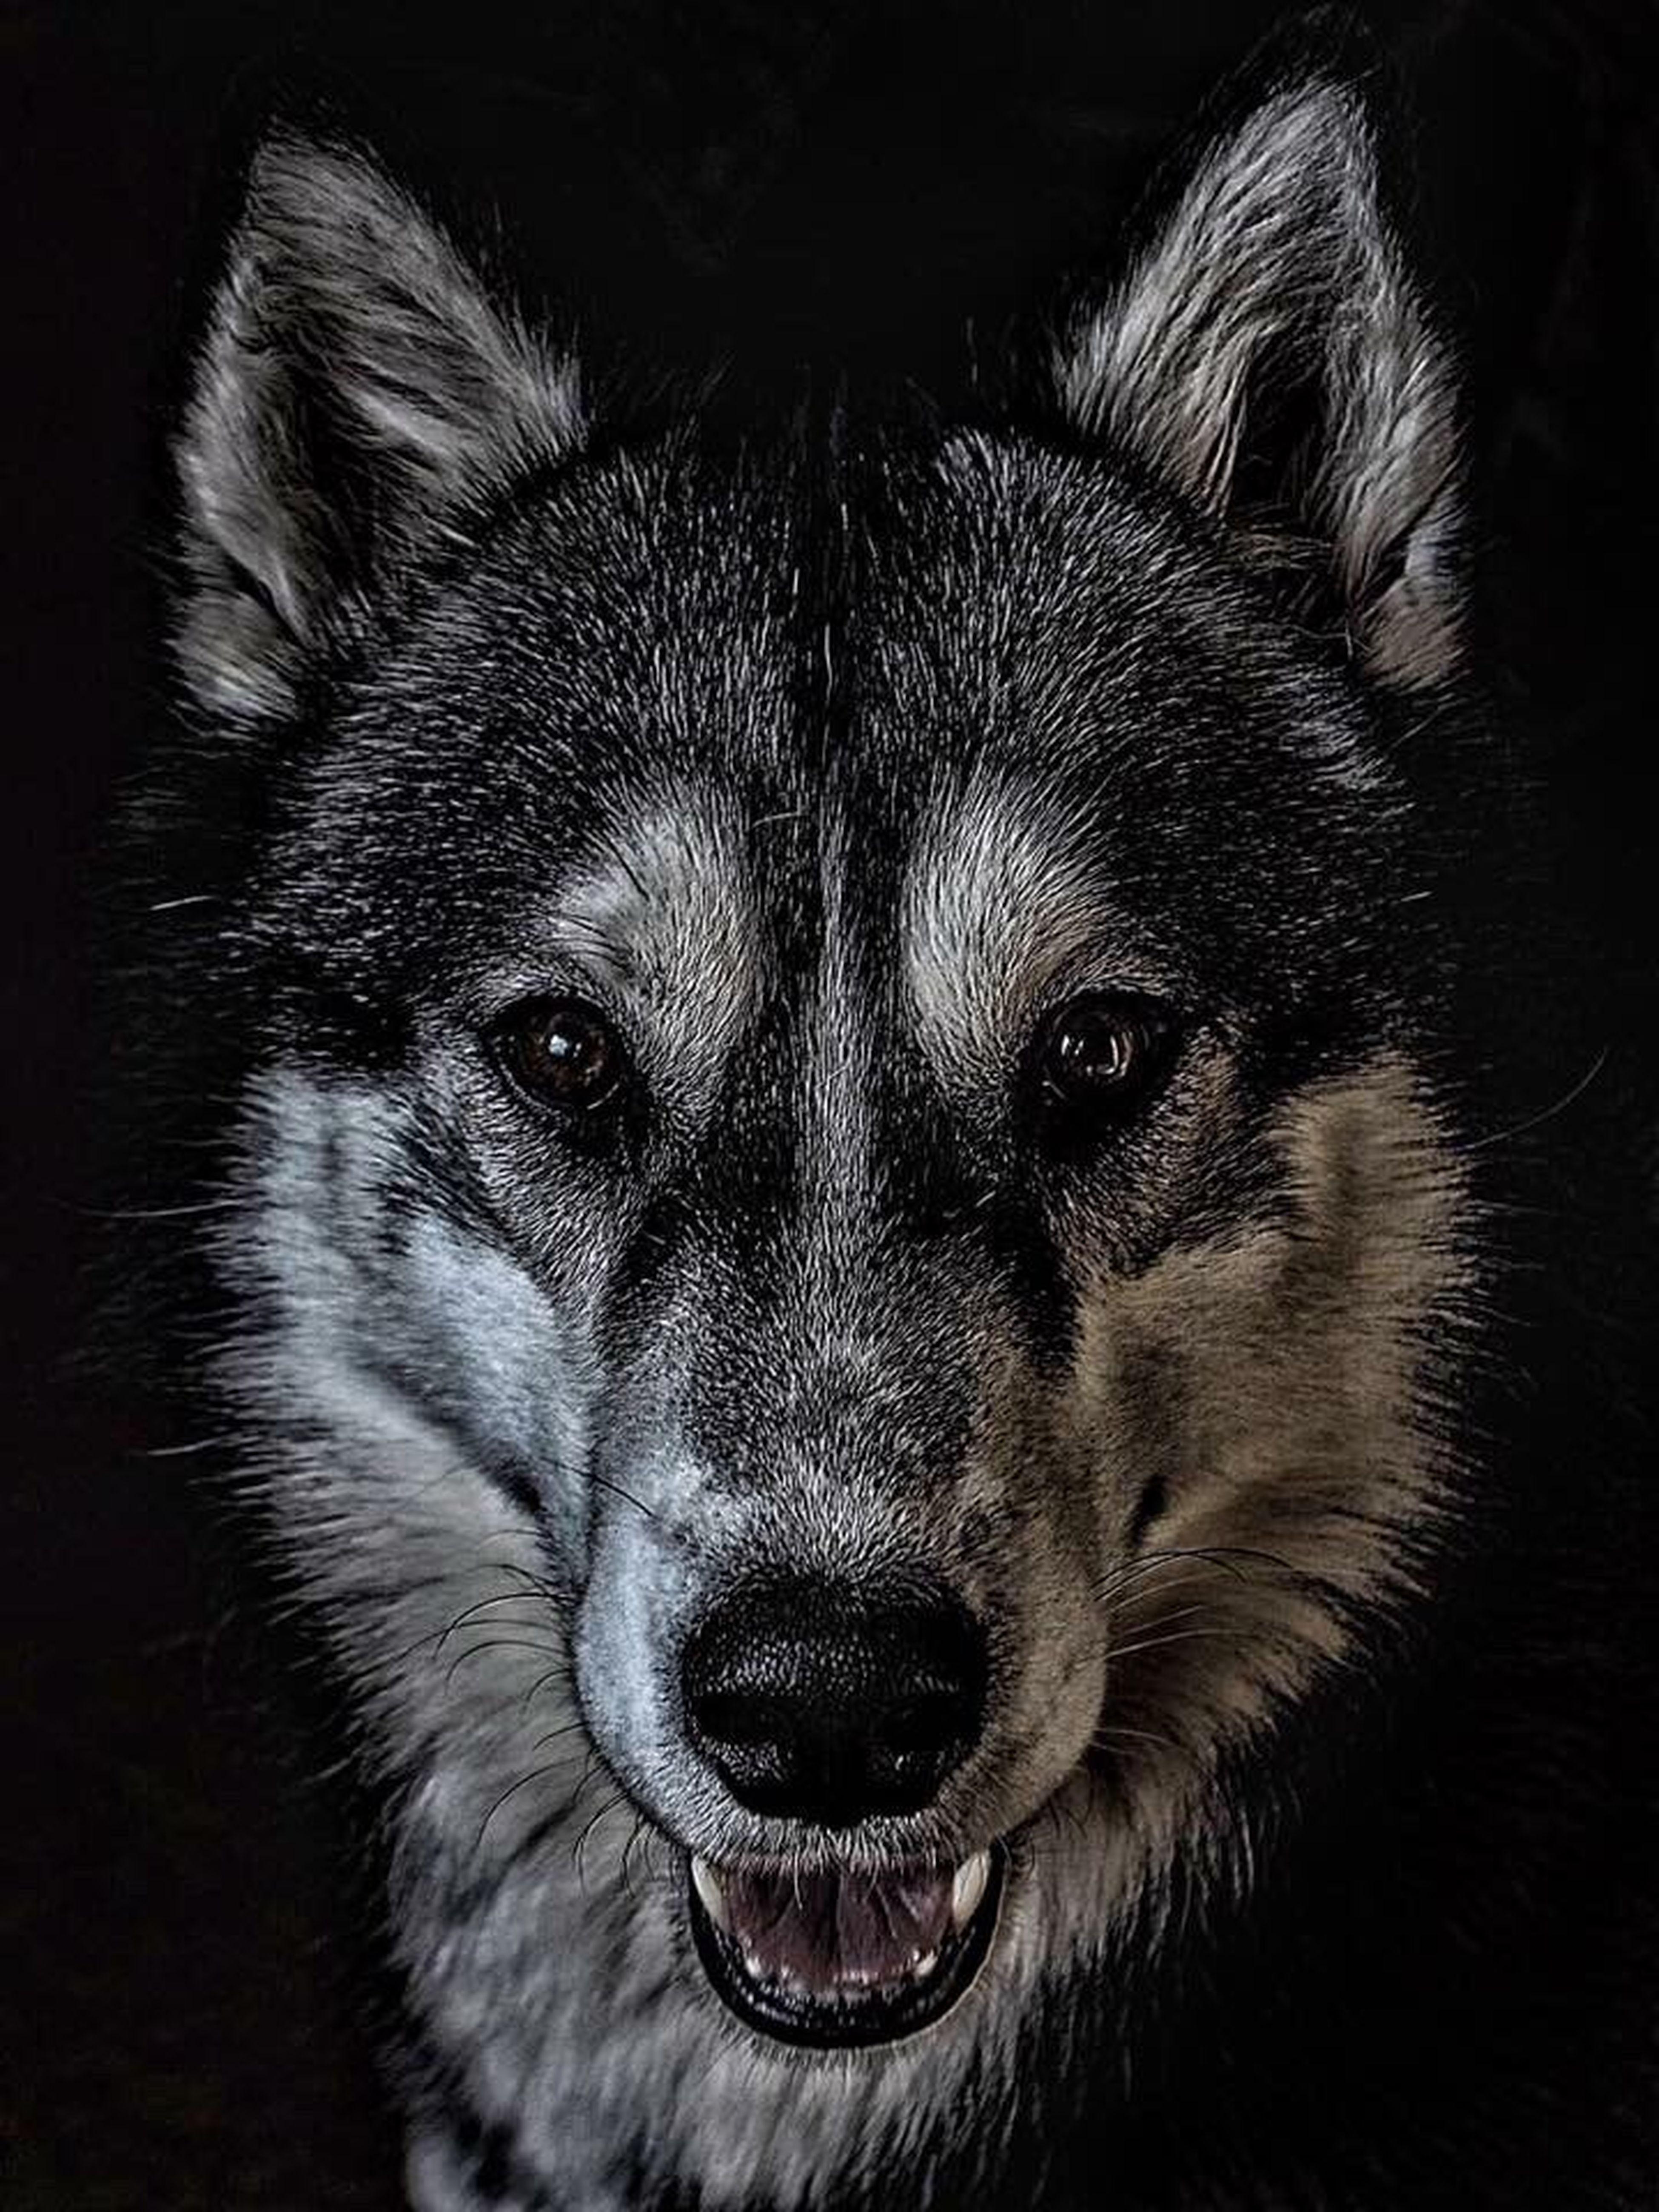 Mein Hauswolf Husky Blackandwhite Dog Animal Themes Looking At Camera One Animal Animal Hair Black Background Animal Head  Close-up Portrait Wolf Pets Love First Eyeem Photo EyeEmNewHere Germany in Bitz EyeEmNewHere